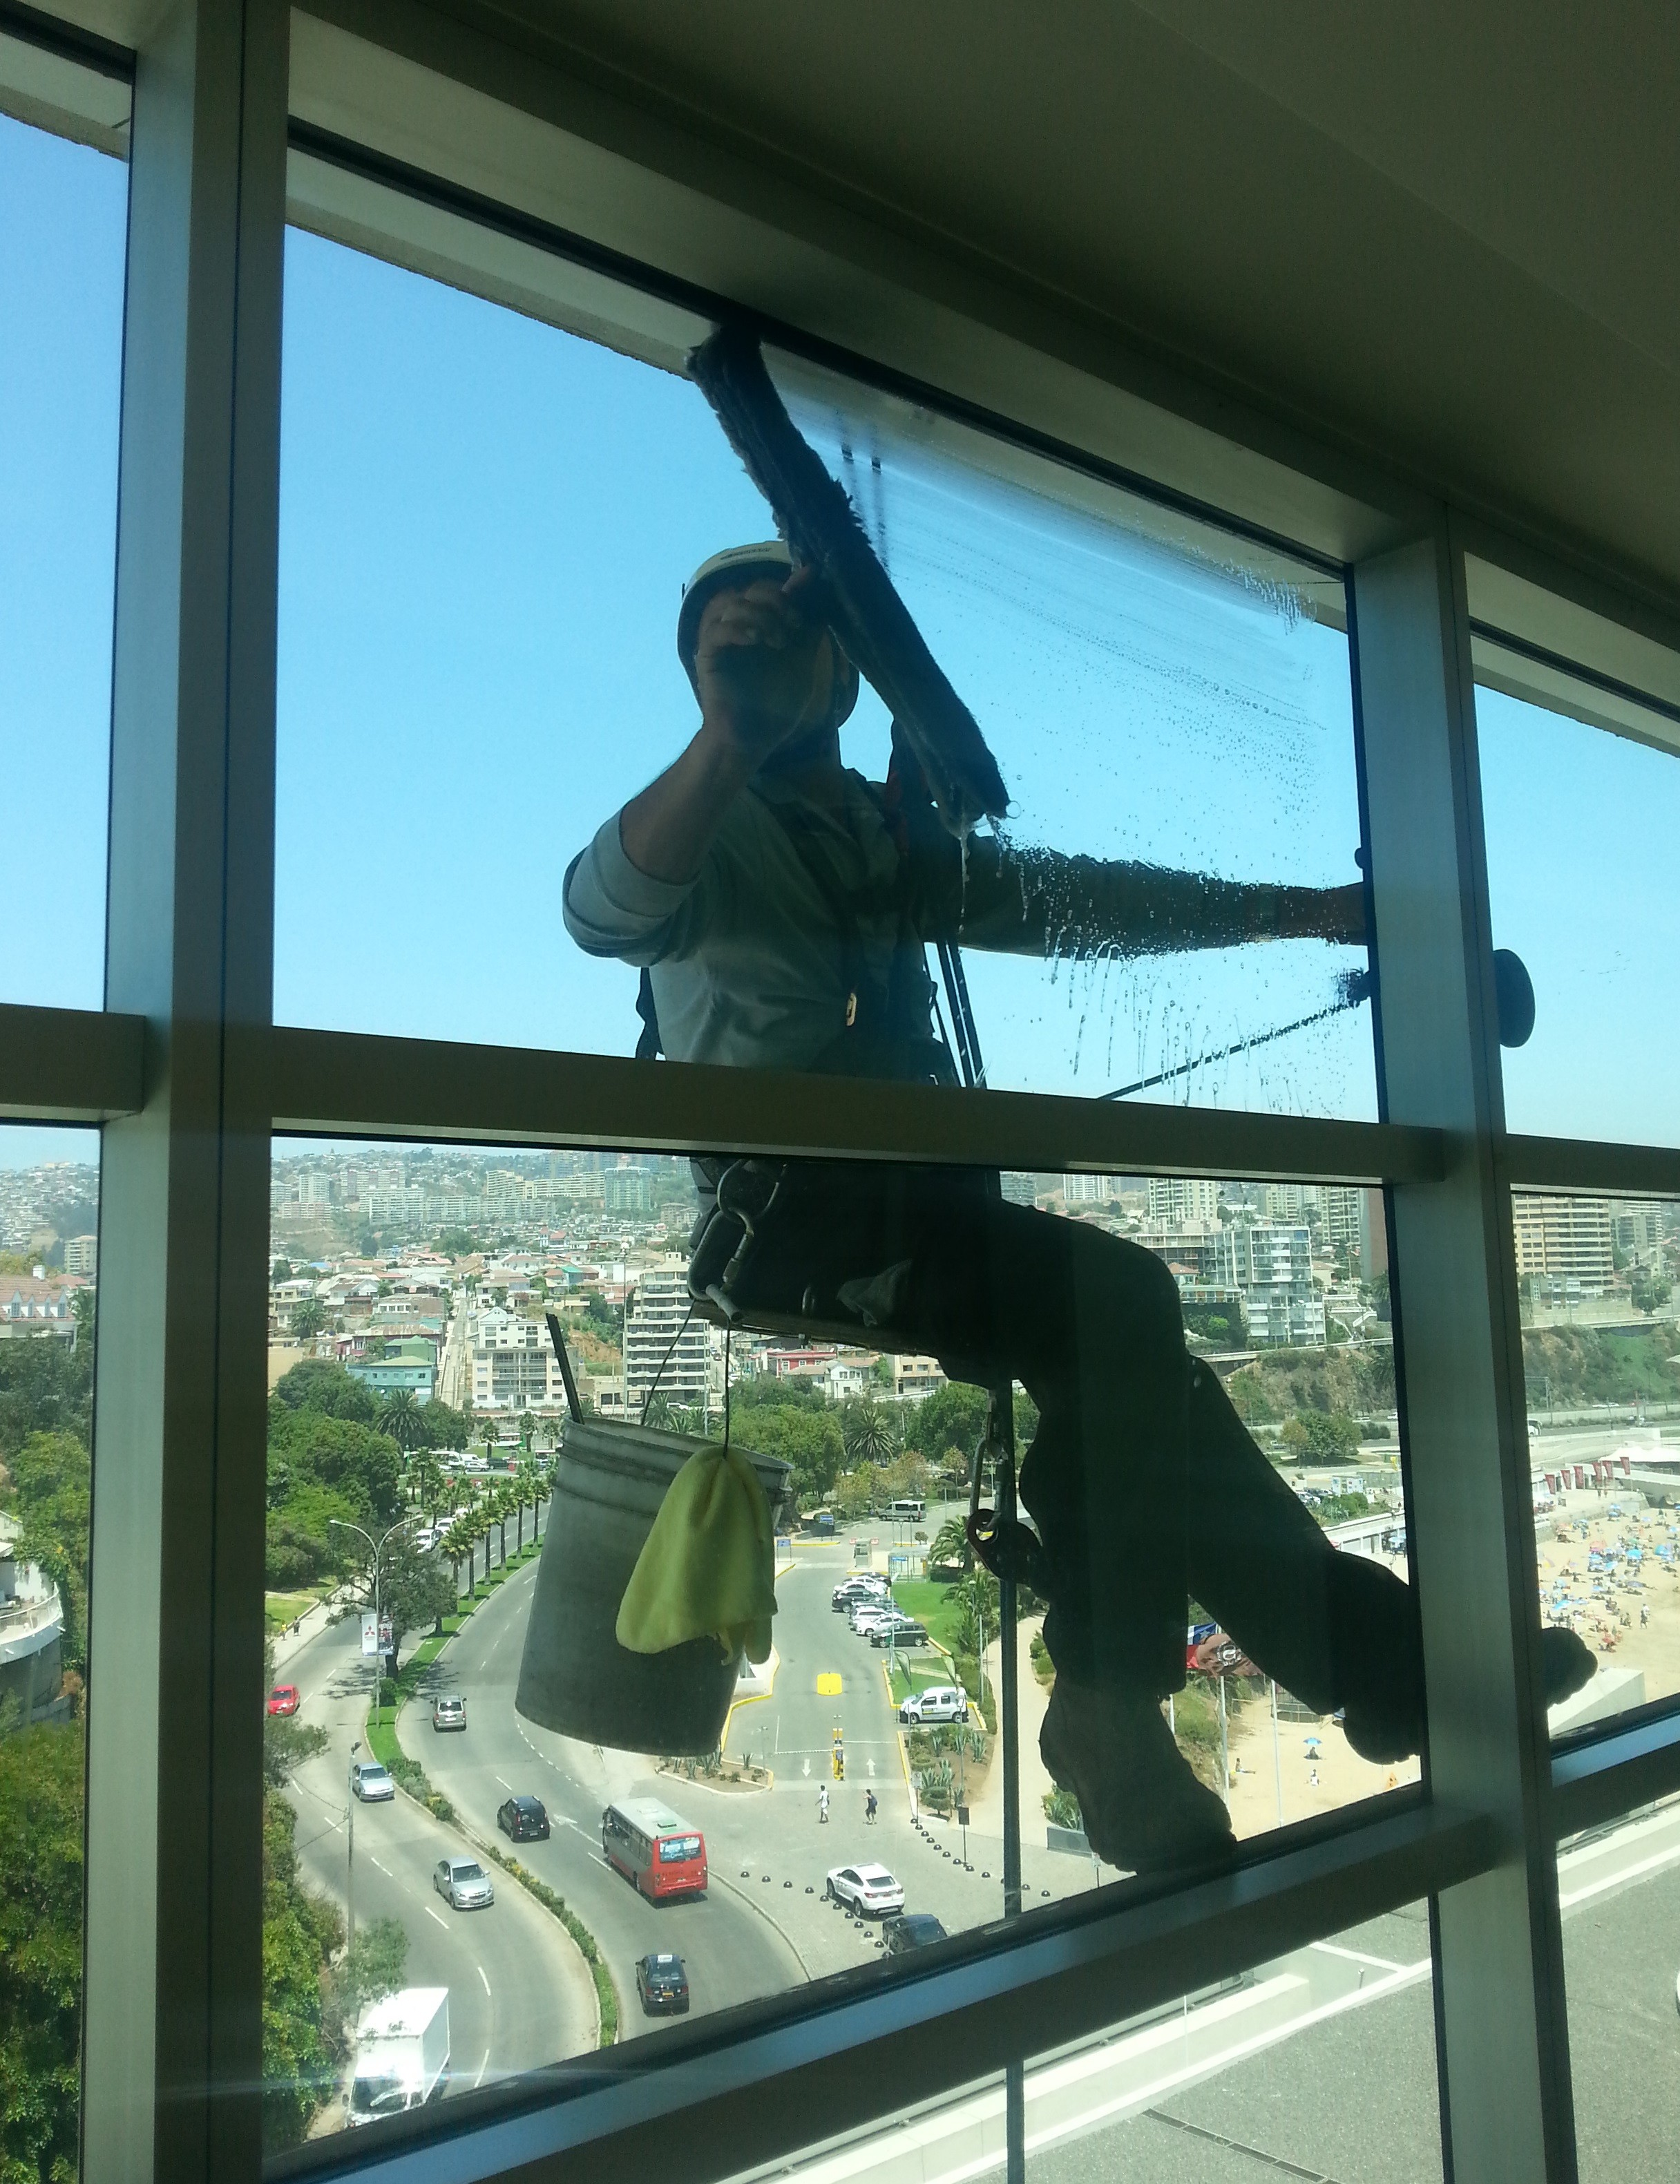 te-imaginas-trabajar-a-100-metros-de-altura